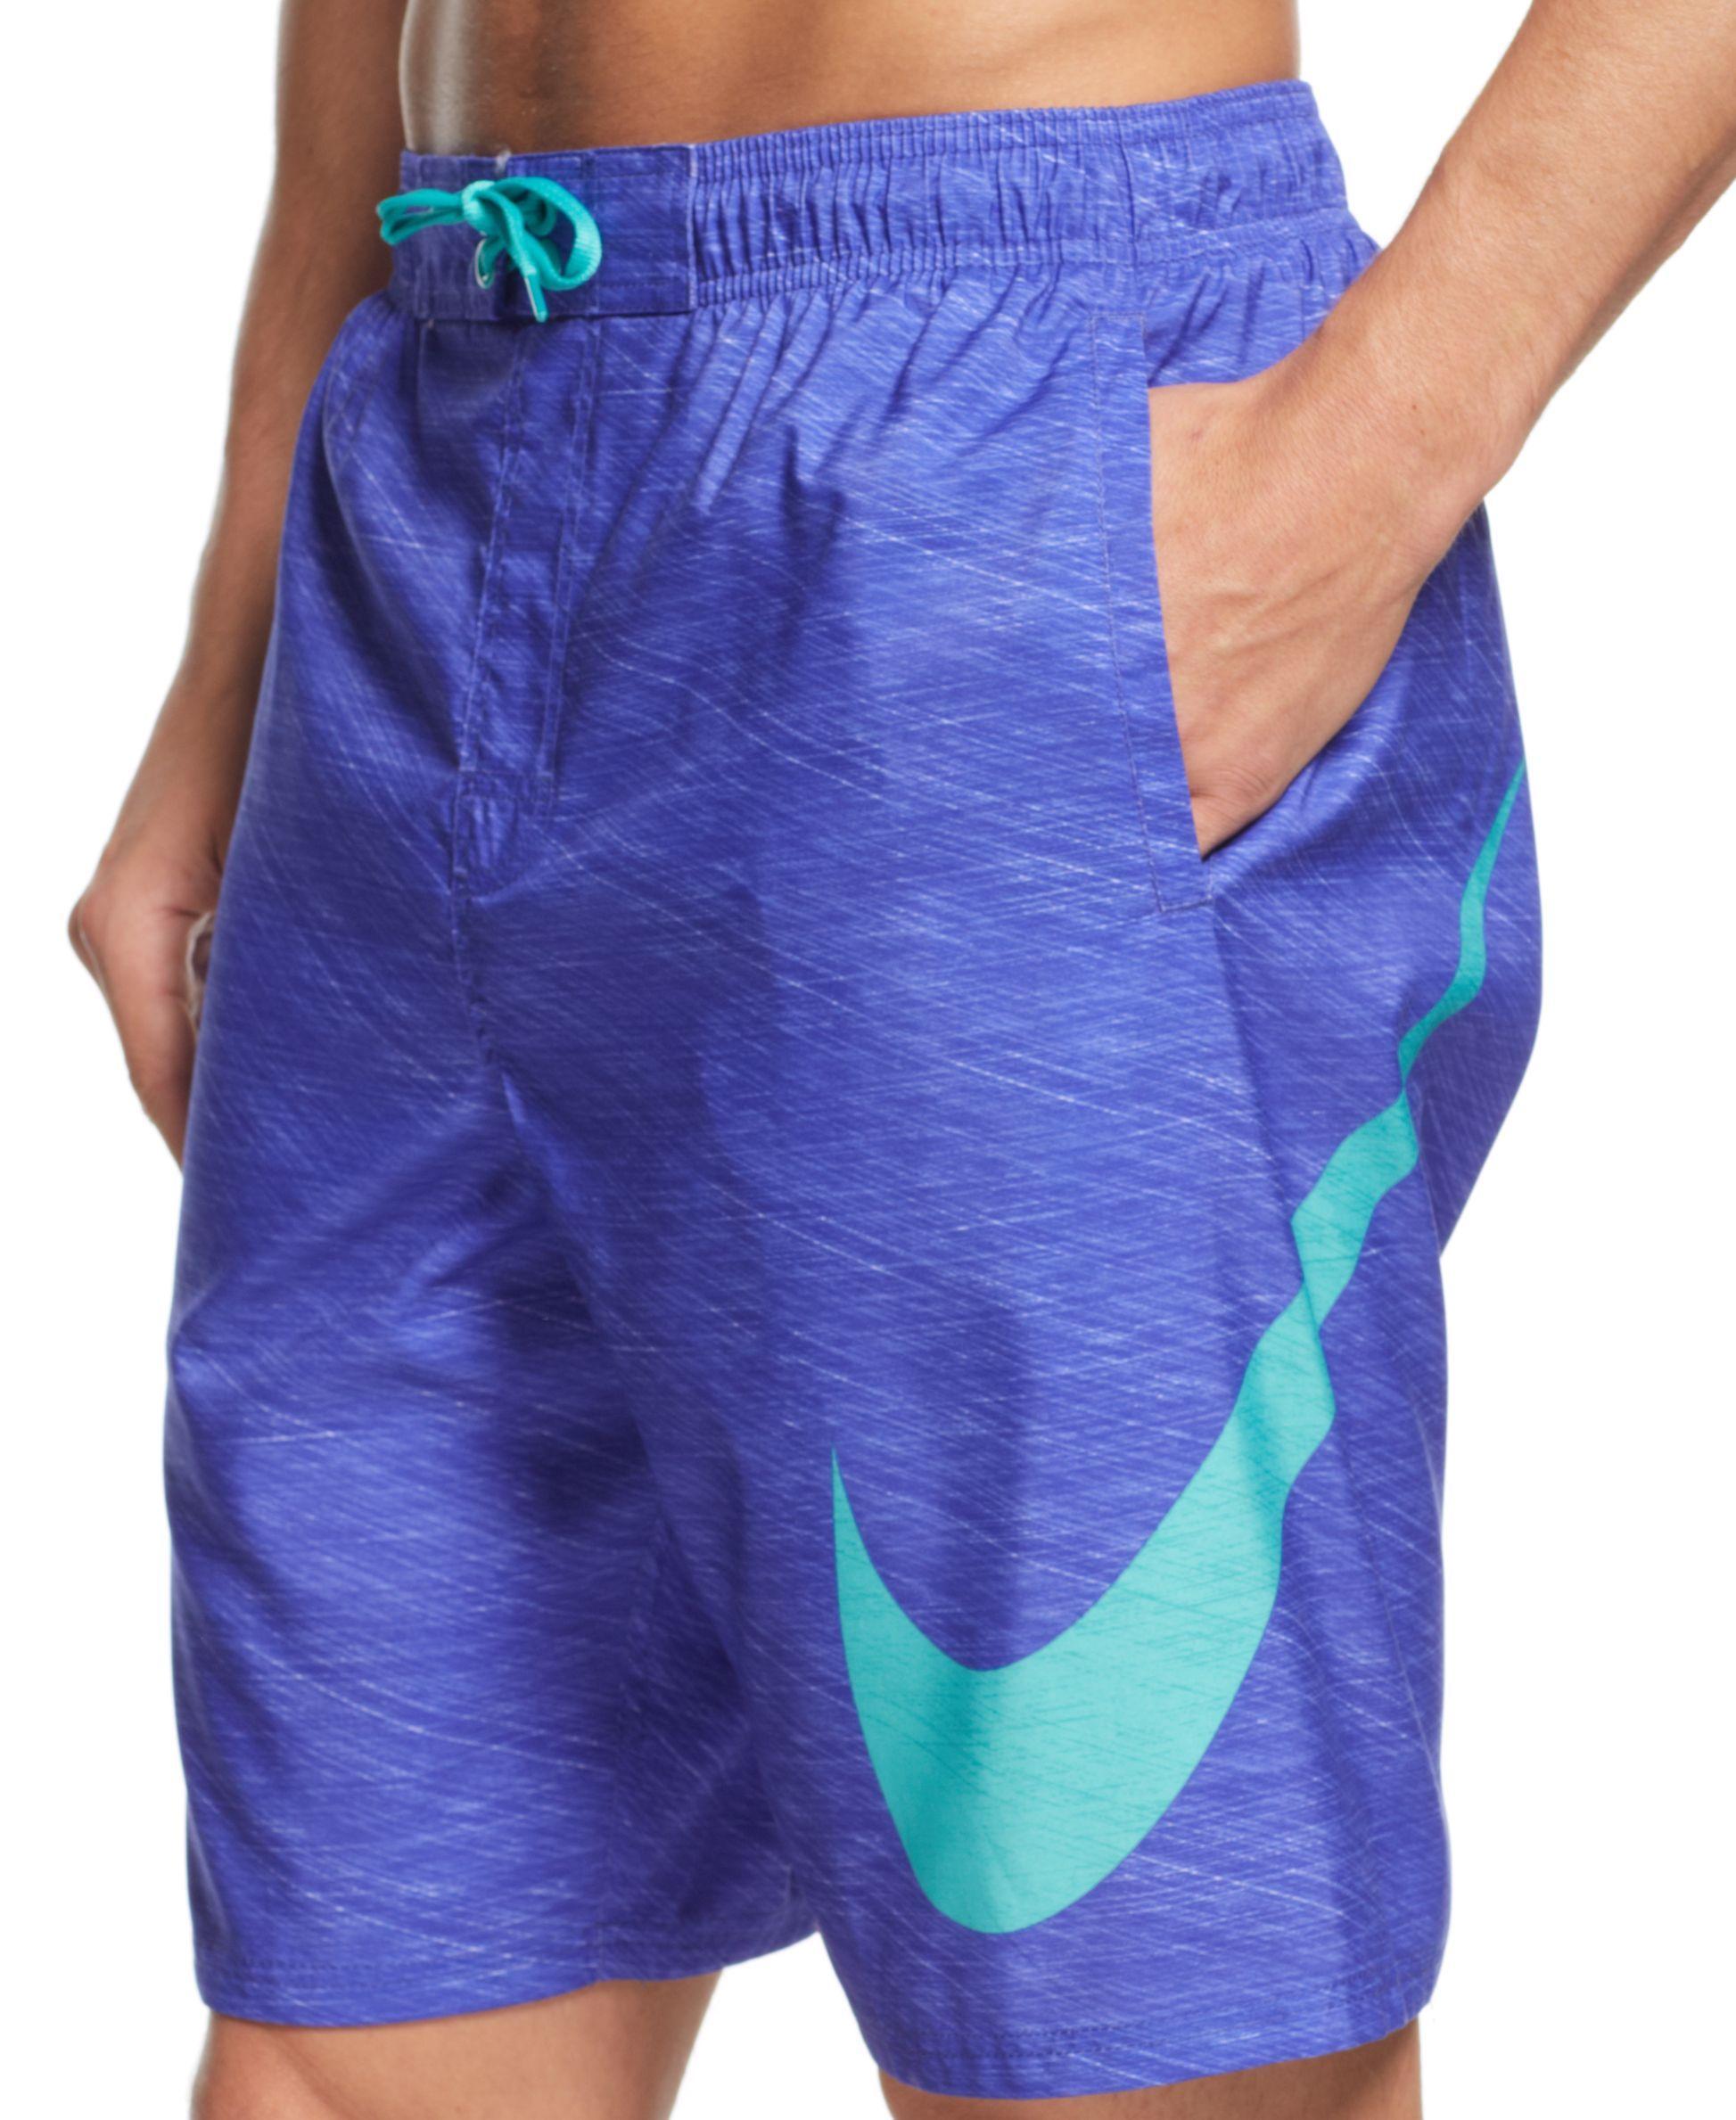 Gorrión Partina City loseta  Nike Hyper Flash 9 Volley Swim Shorts - Swimwear - Men - Macy's   Mens  workout clothes, Swim shorts, Athletic fashion